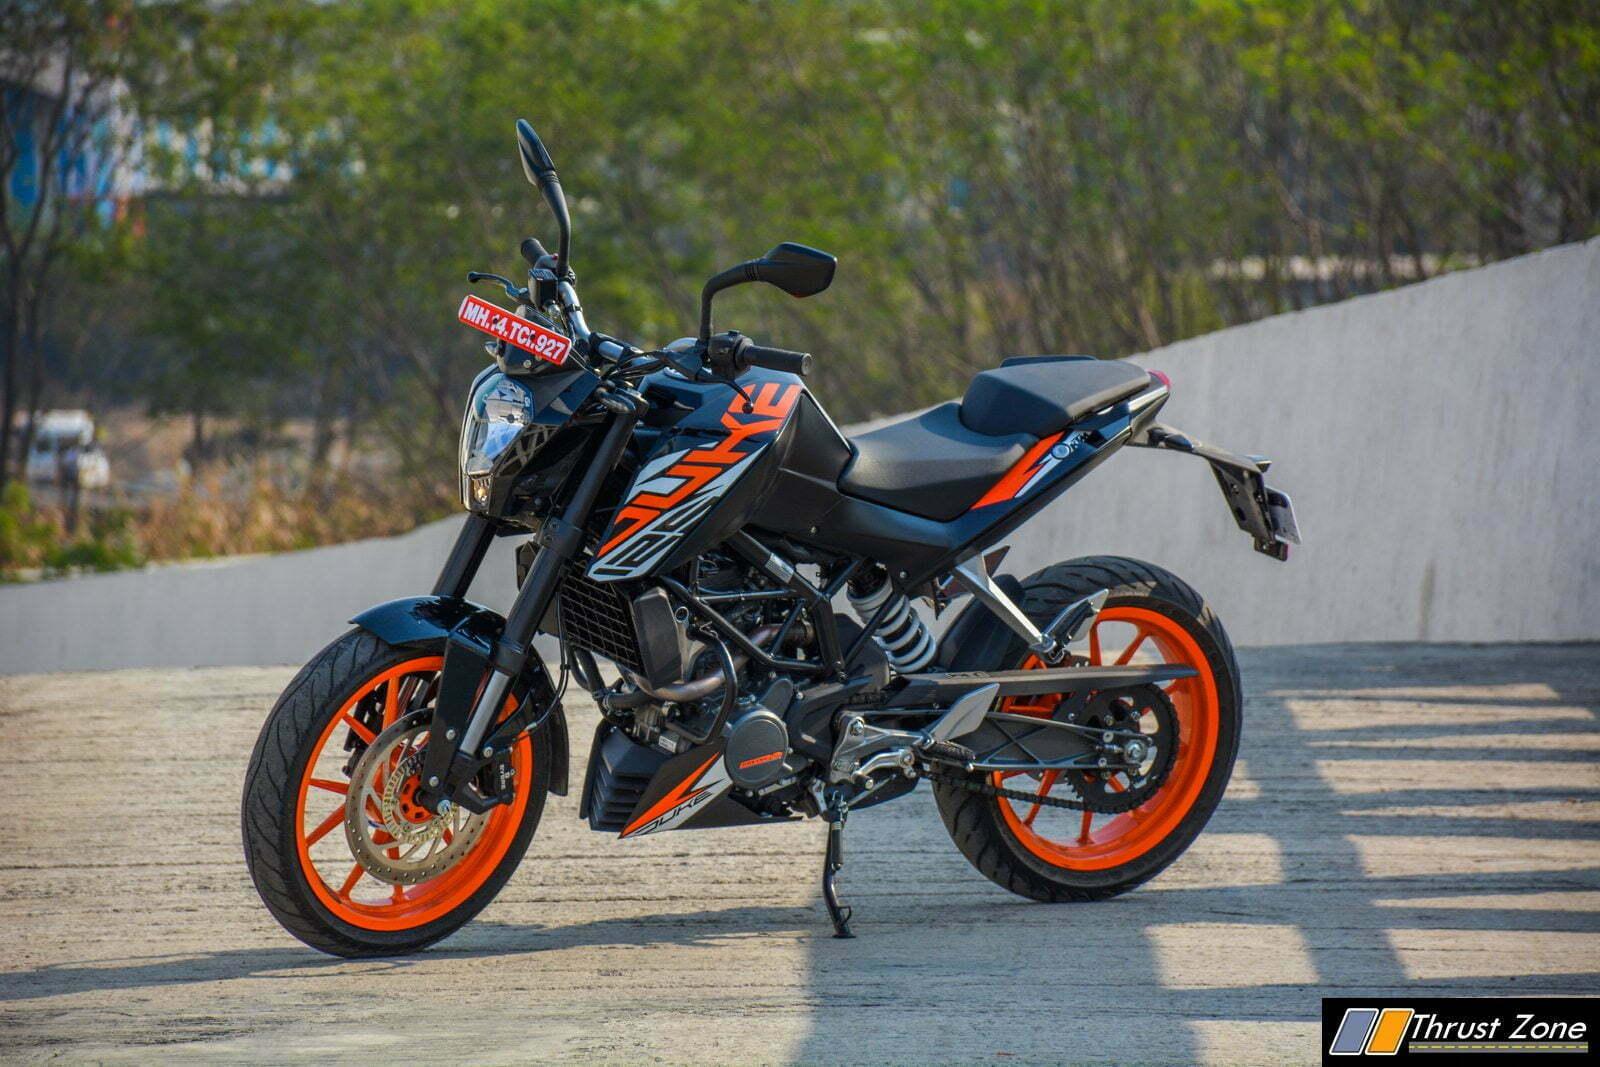 http://www.thrustzone.com/wp-content/uploads/2018/12/2018-KTM-DUKE-125-INDIA-Review-11-2.jpg